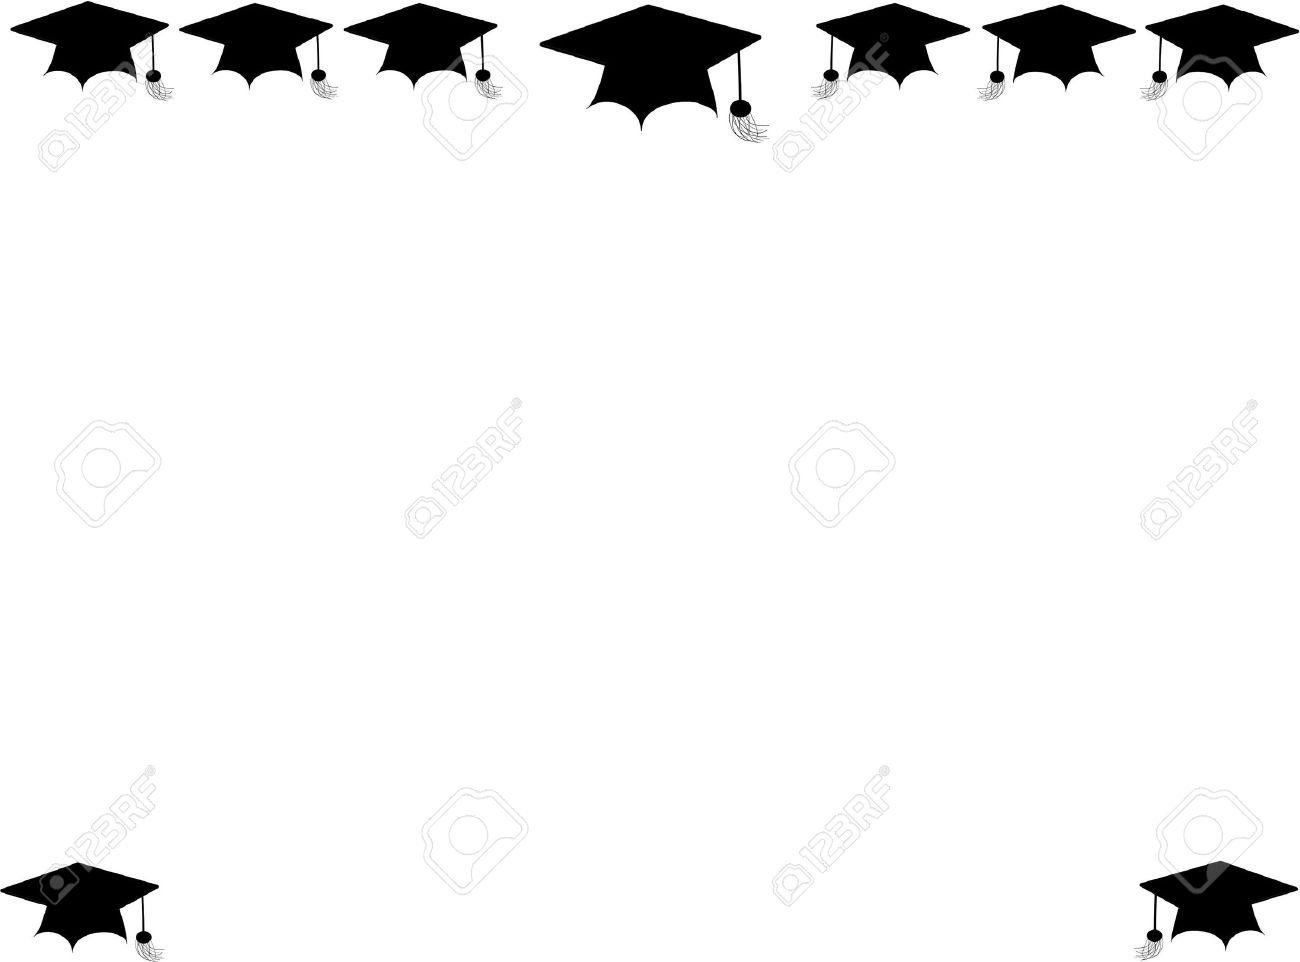 Best Graduation Border #11939.